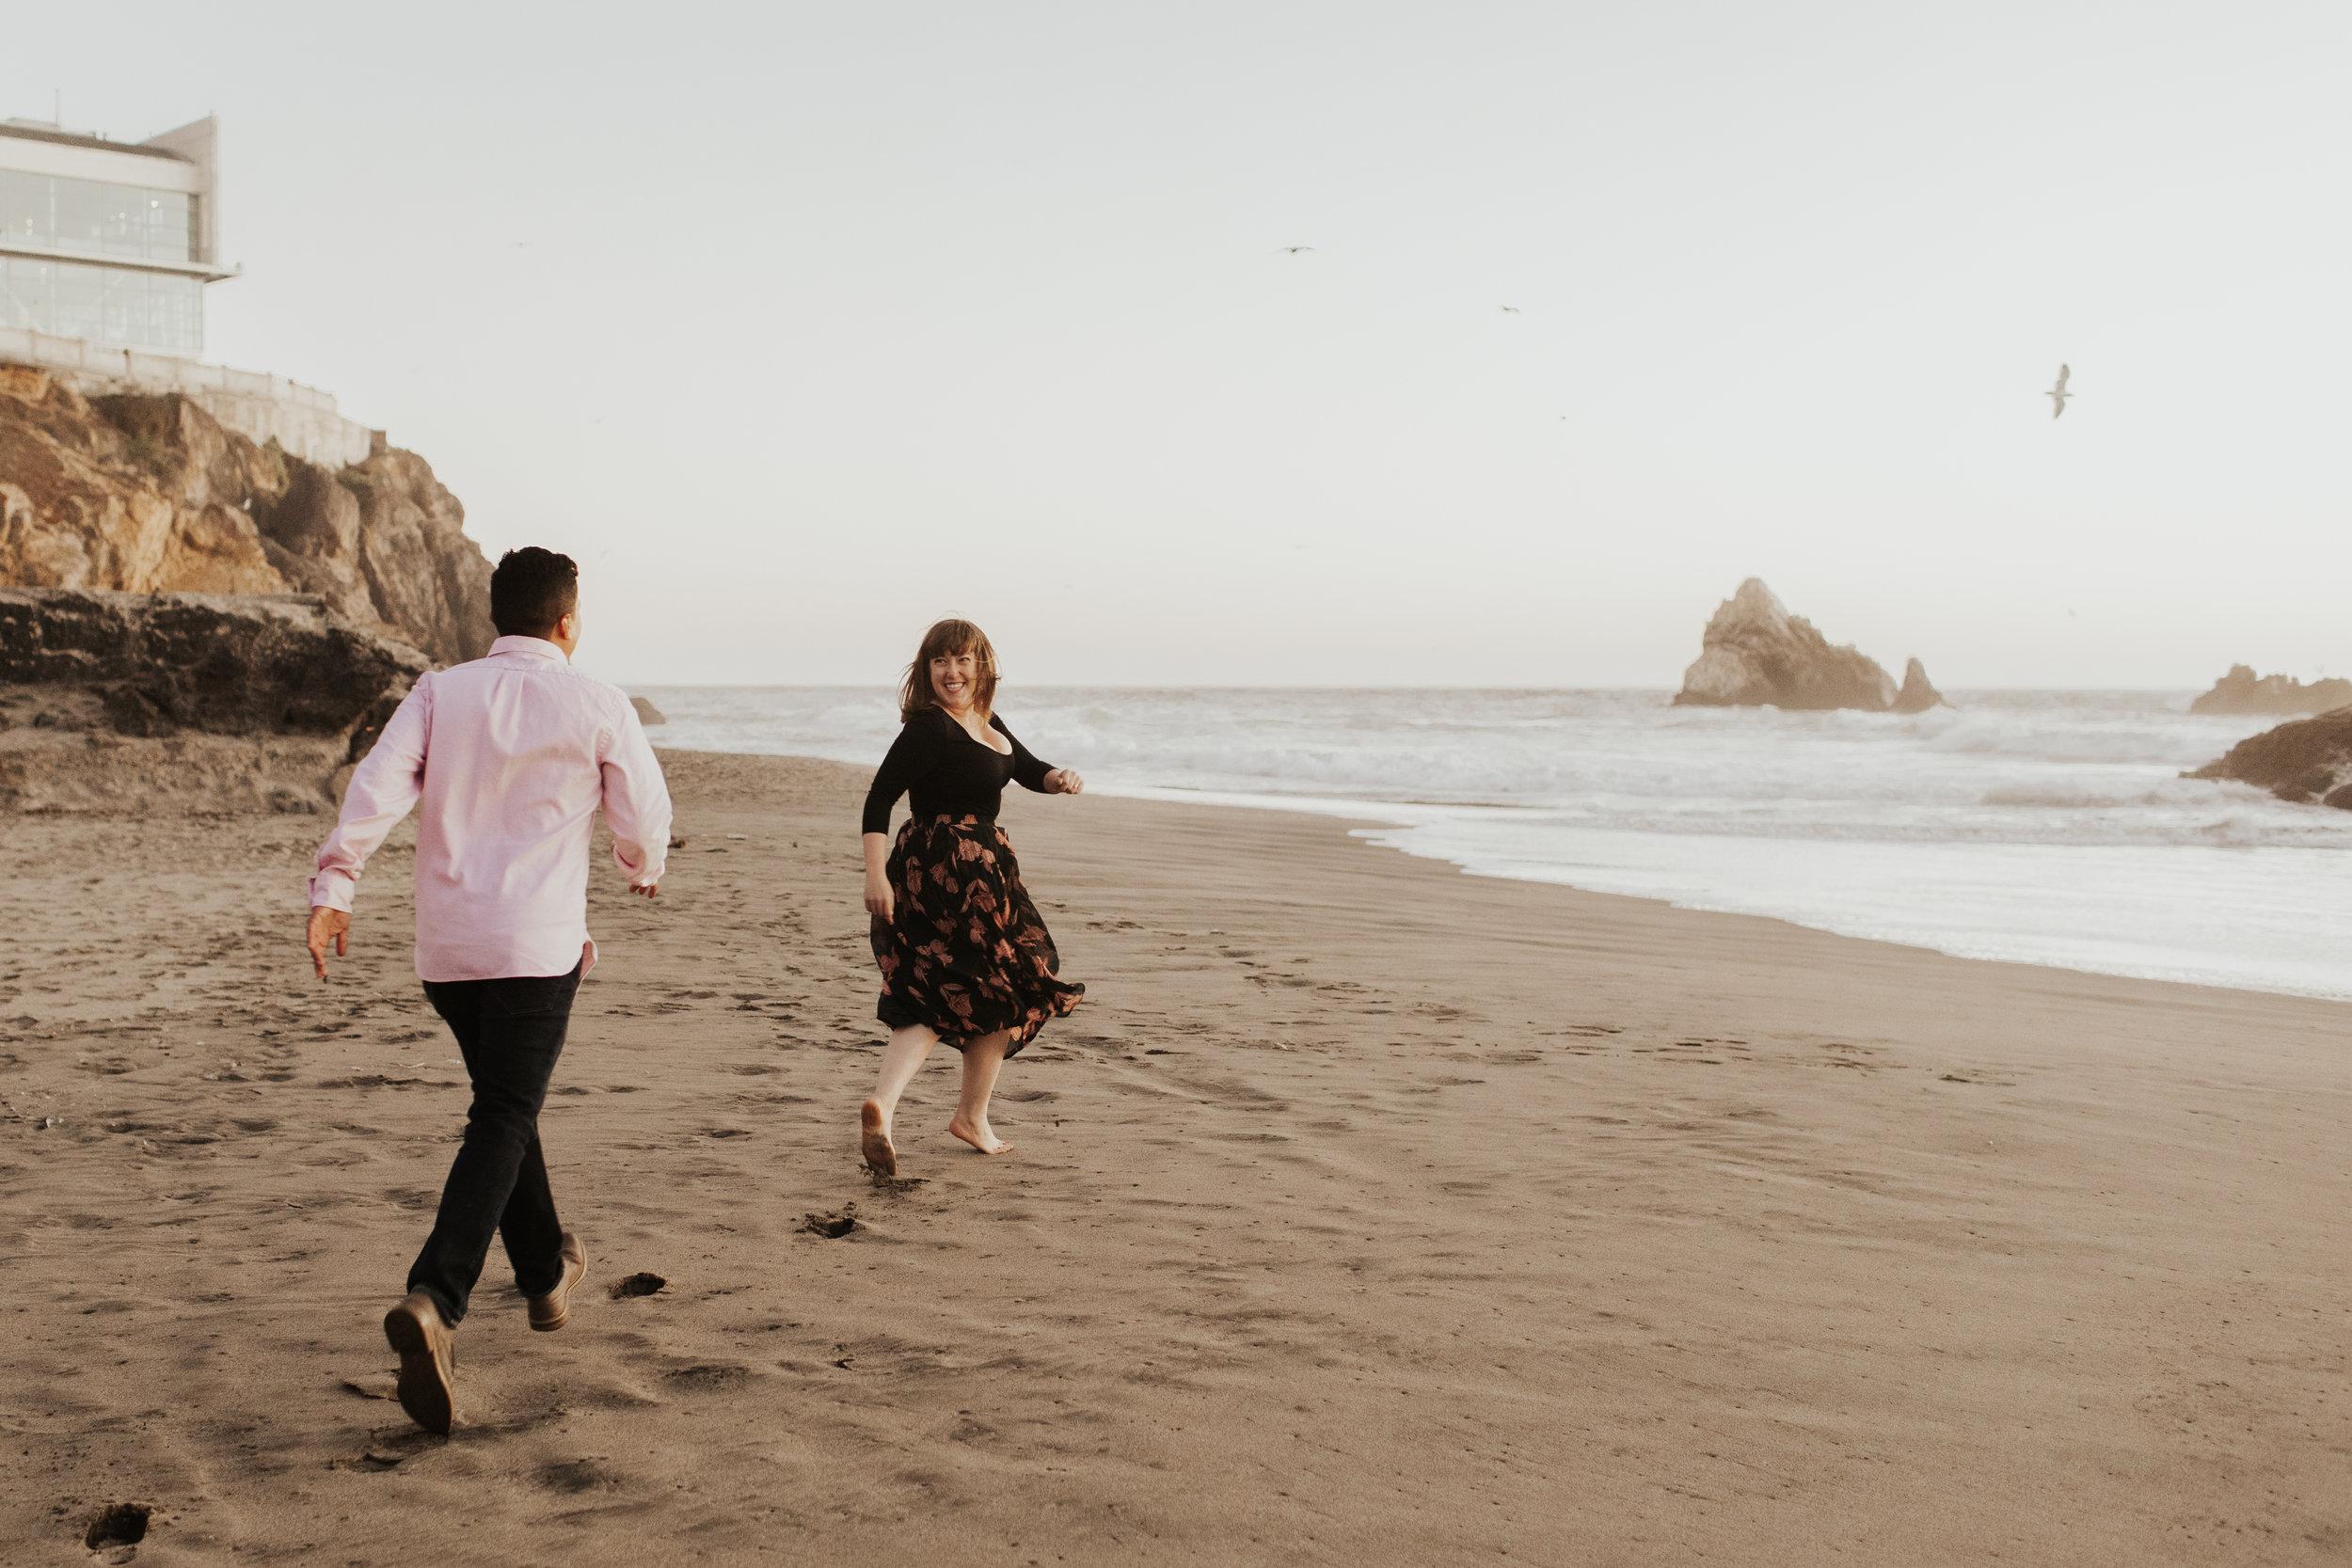 Erin-Rene-Kramer-Finished-San-Francisco-Redwoods-Legion-of-Honor-Sutro-Baths-Engagement-Session-with-Dog-113.jpg